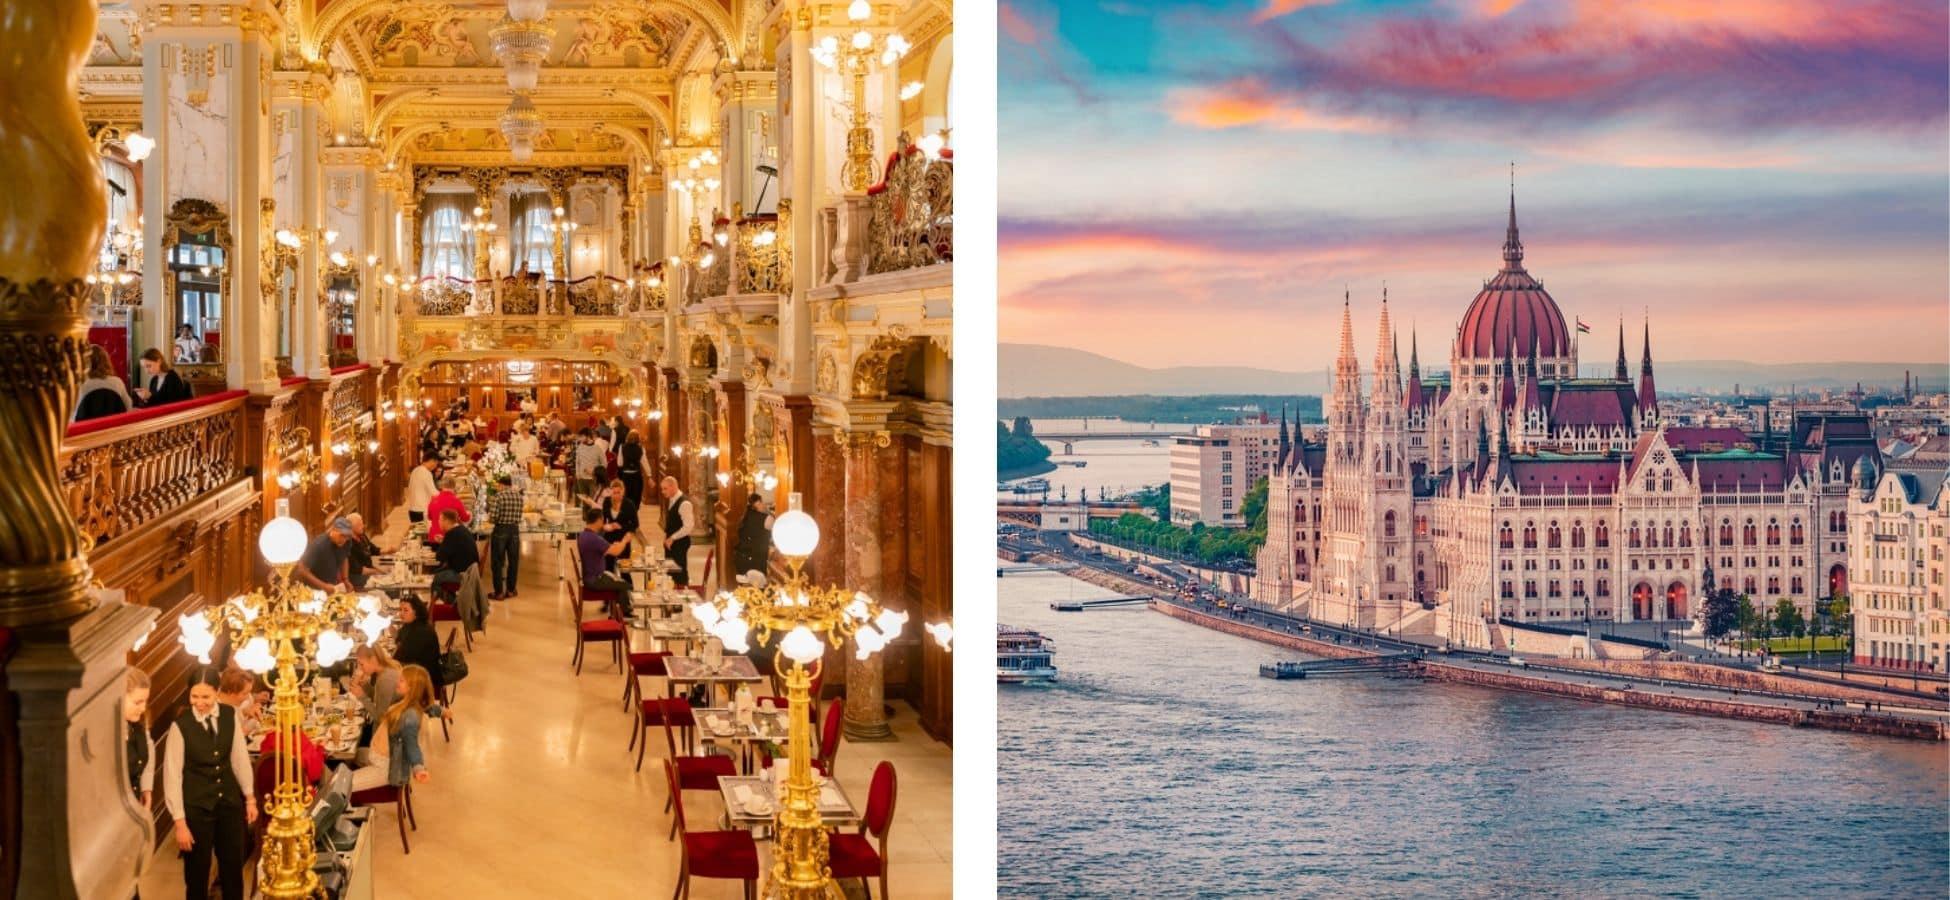 Budapest - Sissi l'impératrice